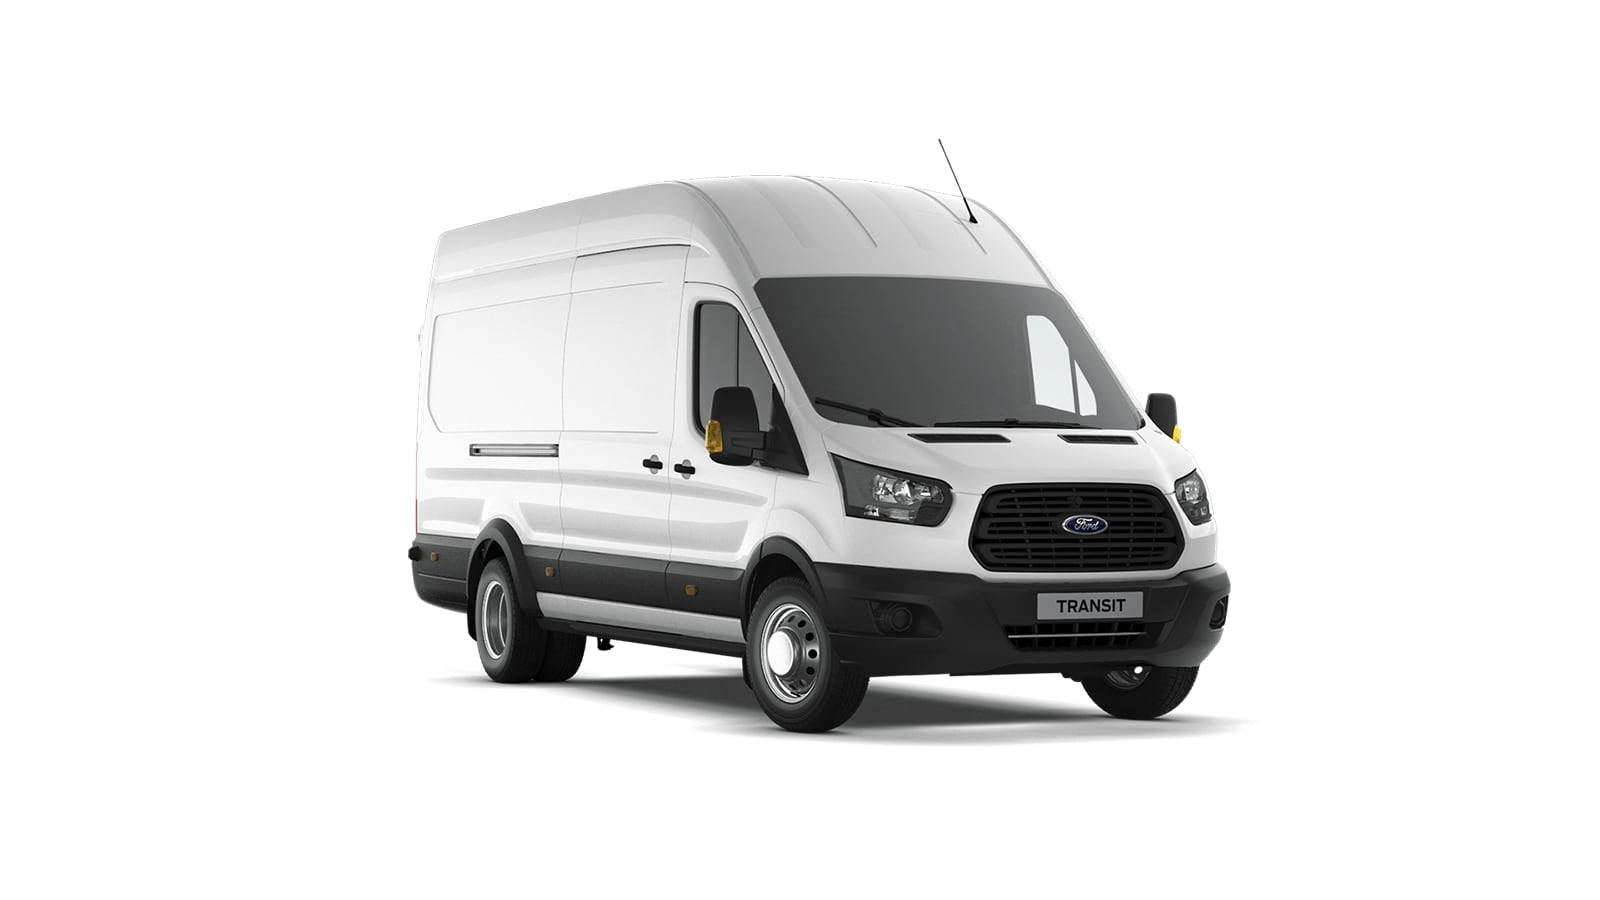 FORD TRANSIT 2.2 TDCI MT (125 л.с.) Грузовой фургон L4H3 Заднеприводный фургон (350 L4 H3)